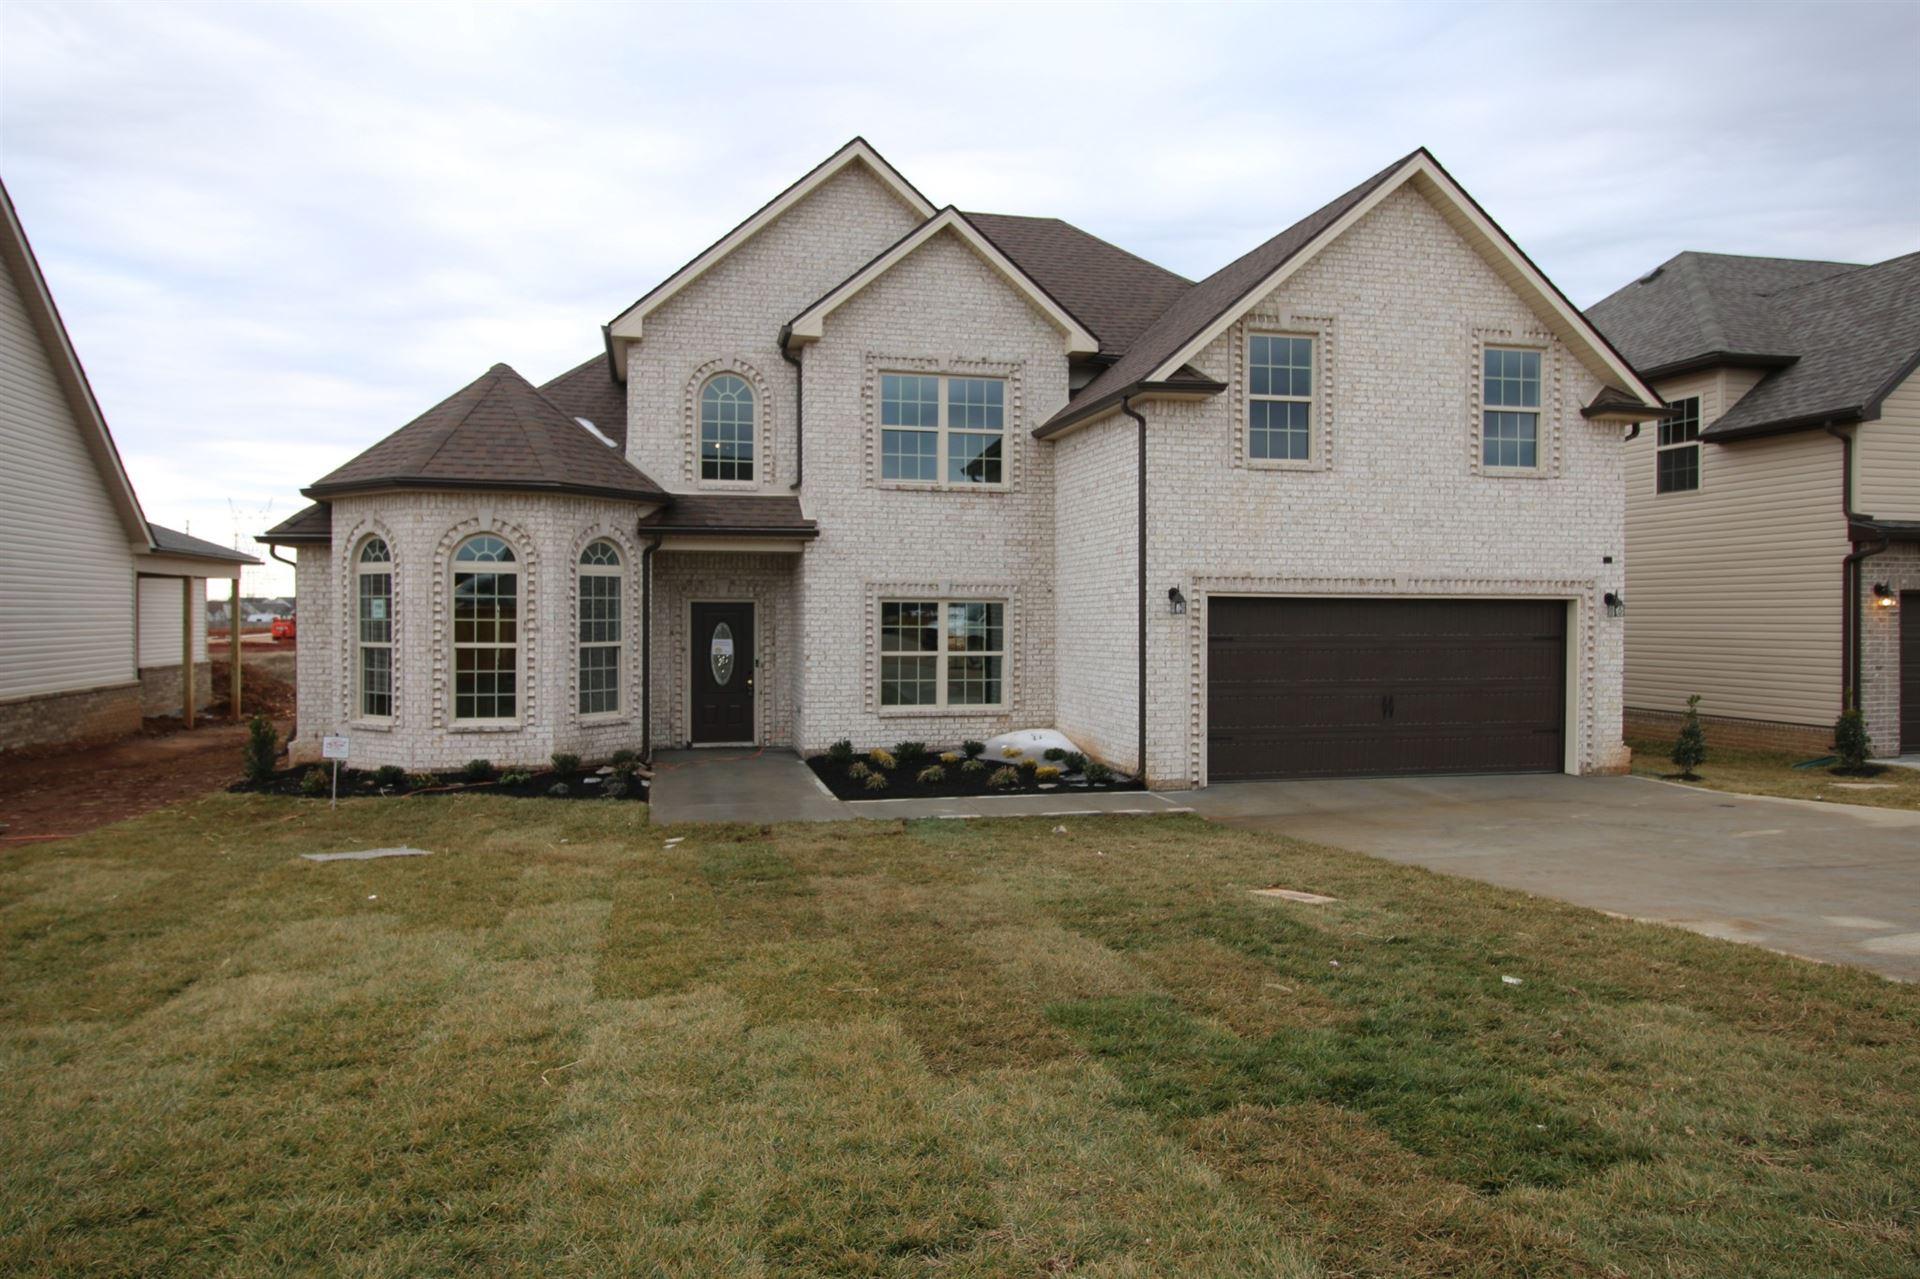 298 Summerfield, Clarksville, TN 37040 - MLS#: 2193710